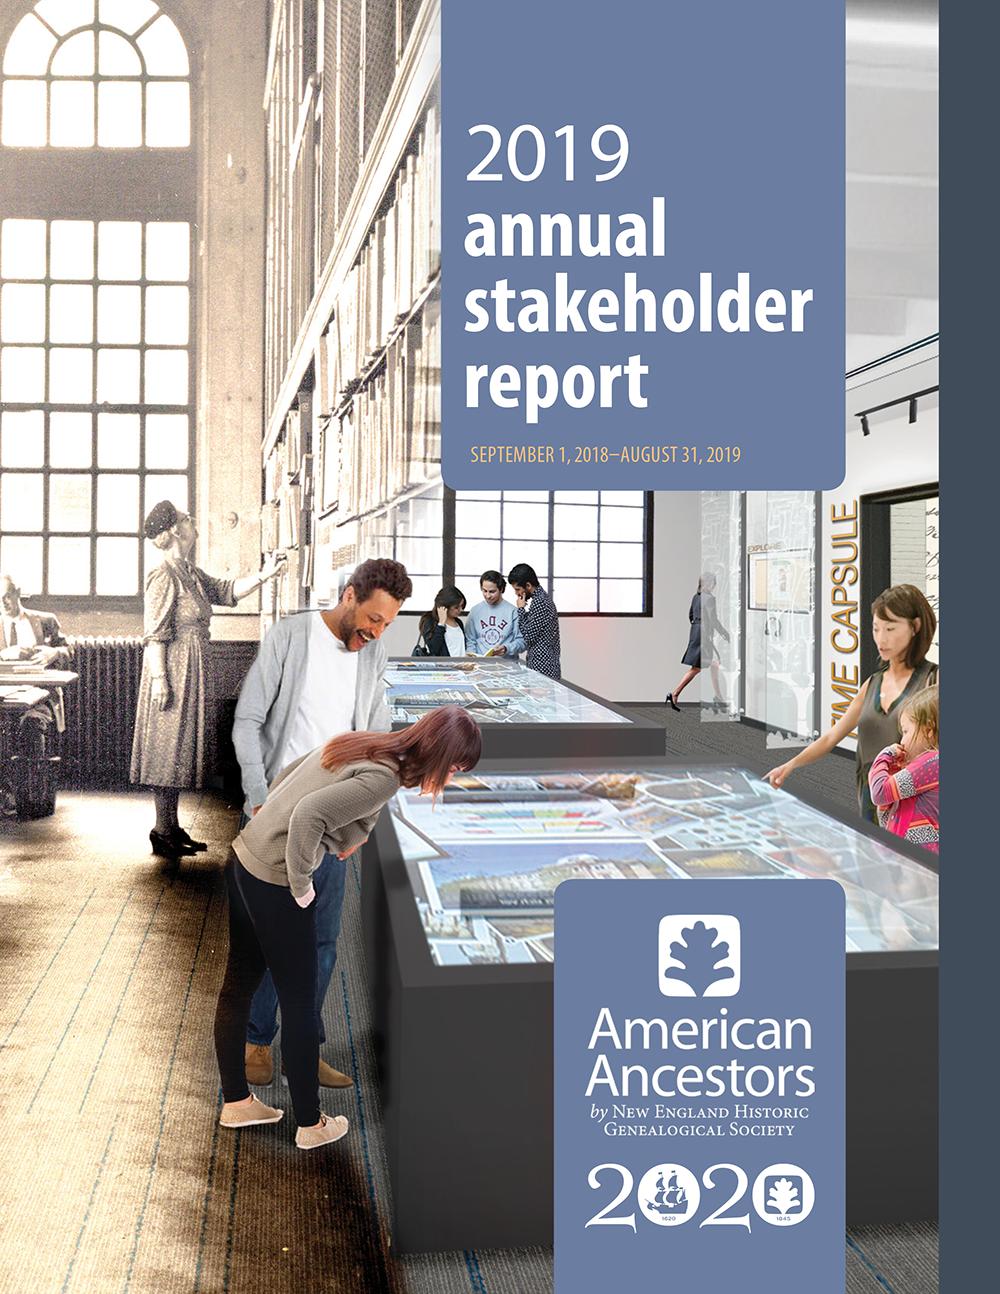 NEHGS 2019 Annual Stakeholder Report